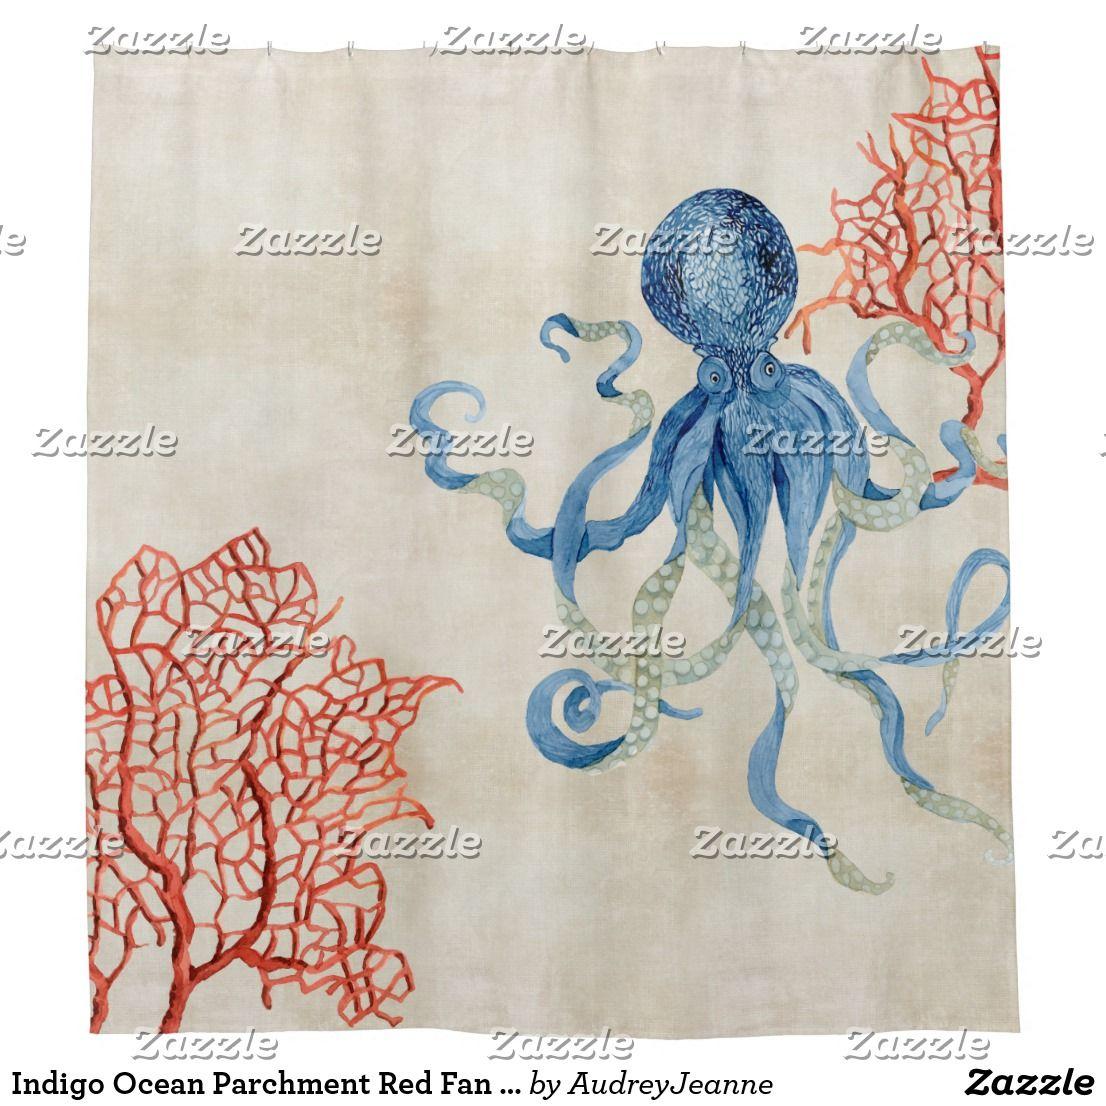 Indigo Ocean Parchment Red Fan Coral Blue Octopus Shower Curtain ...